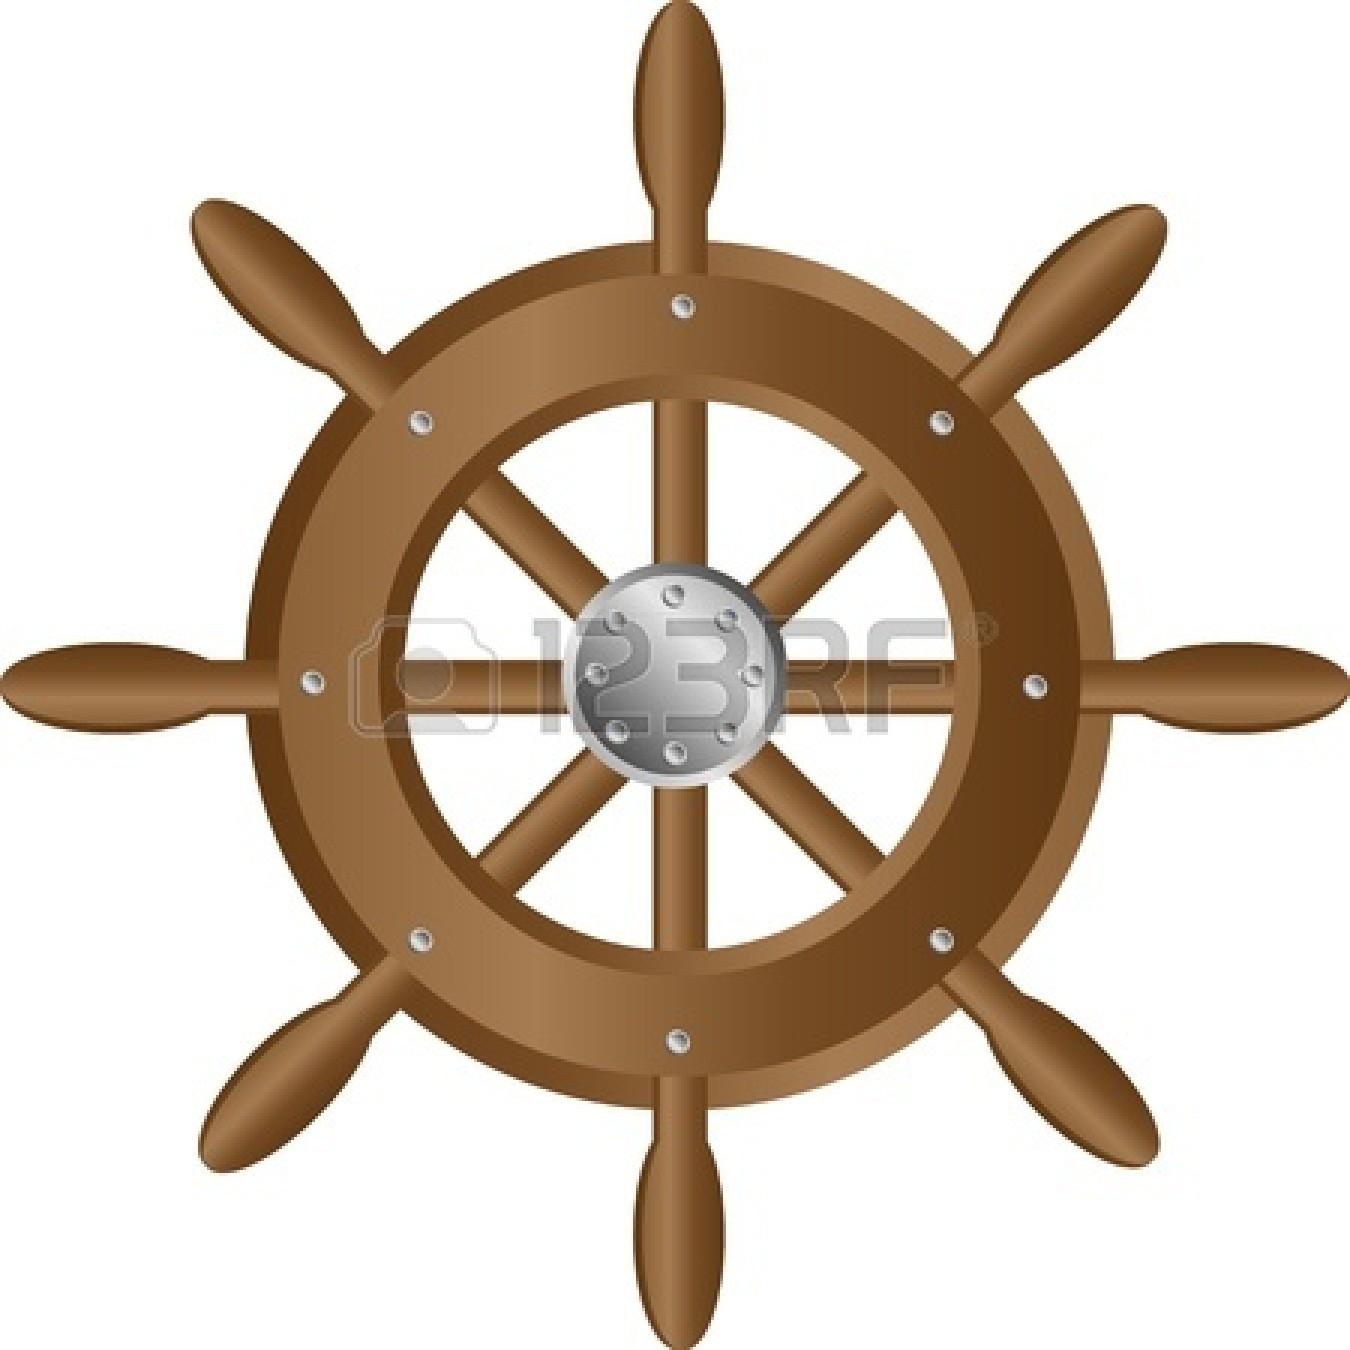 Boat Steering Wheel Clipart.